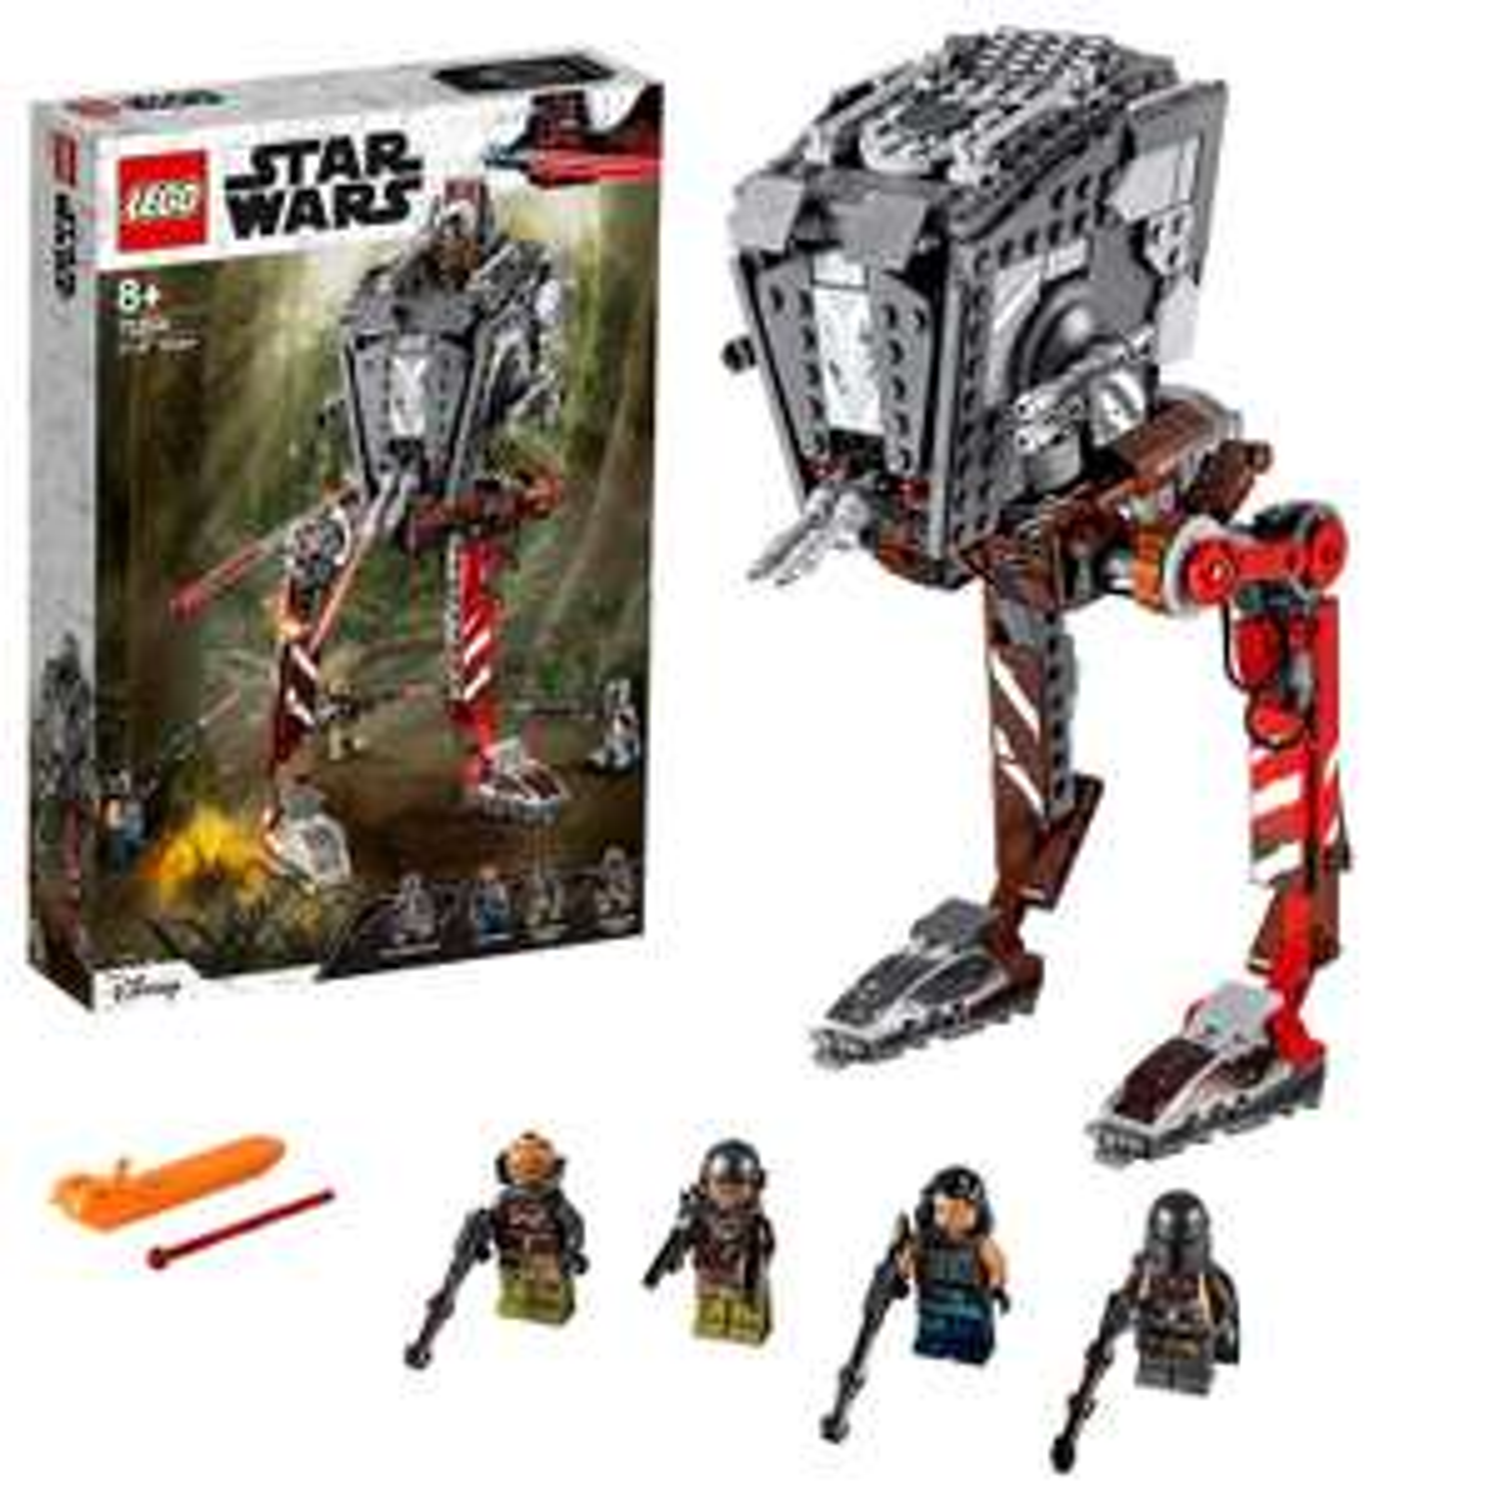 LEGO 75254 Star Wars AT-ST Raider Vehicle (The Mandalorian TV Series) Set £39.98 @ Amazon